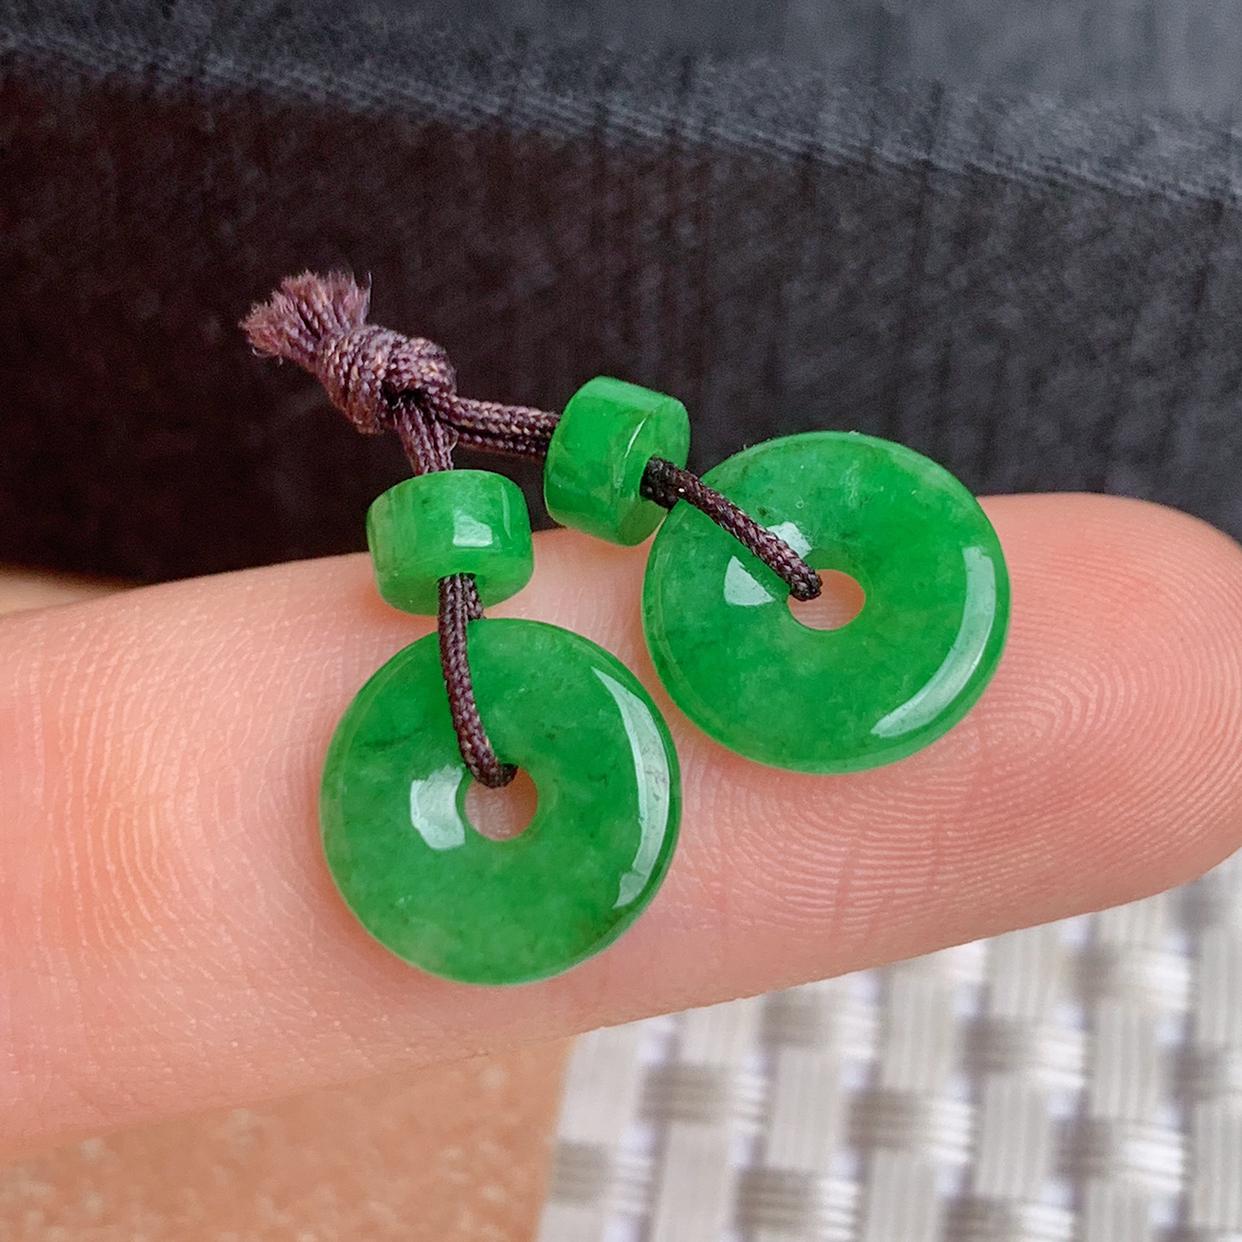 A货翡翠-种好满绿平安扣耳坠,尺寸-10.2*1.9mm